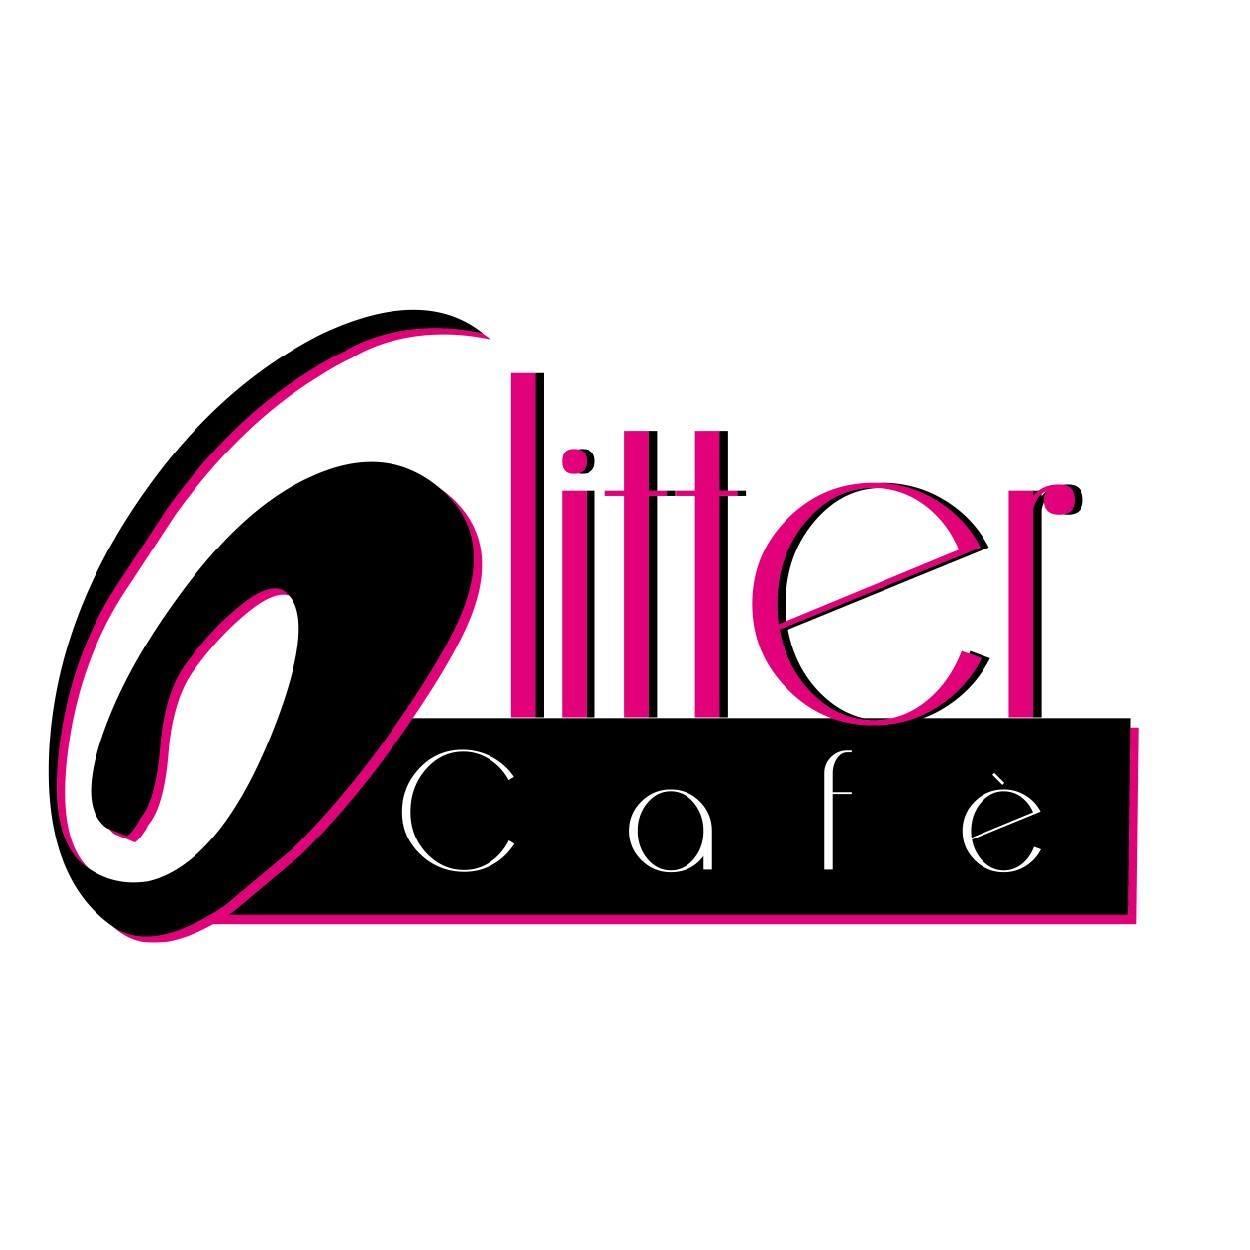 LOGO GLITTER CAFE